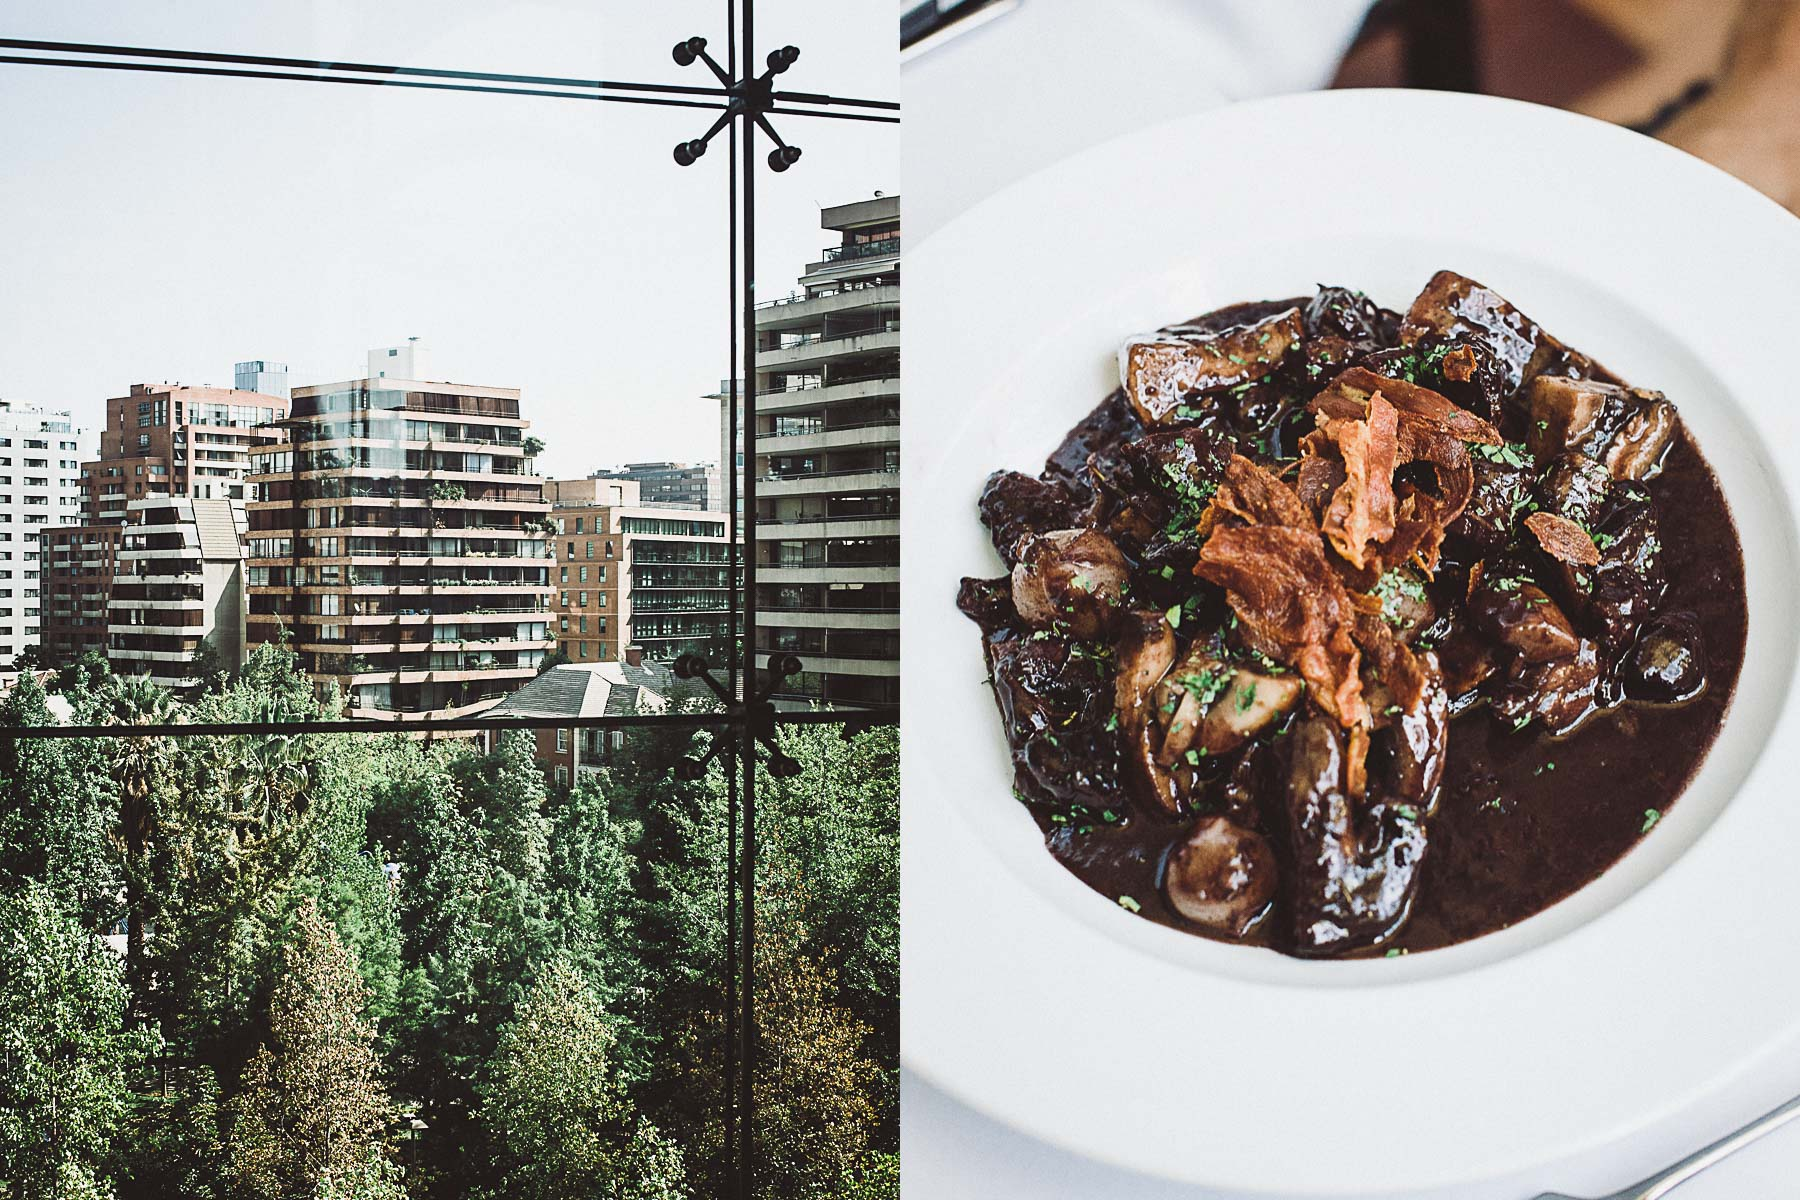 bistro-km-0-luxury-dining-santiago-chile-06